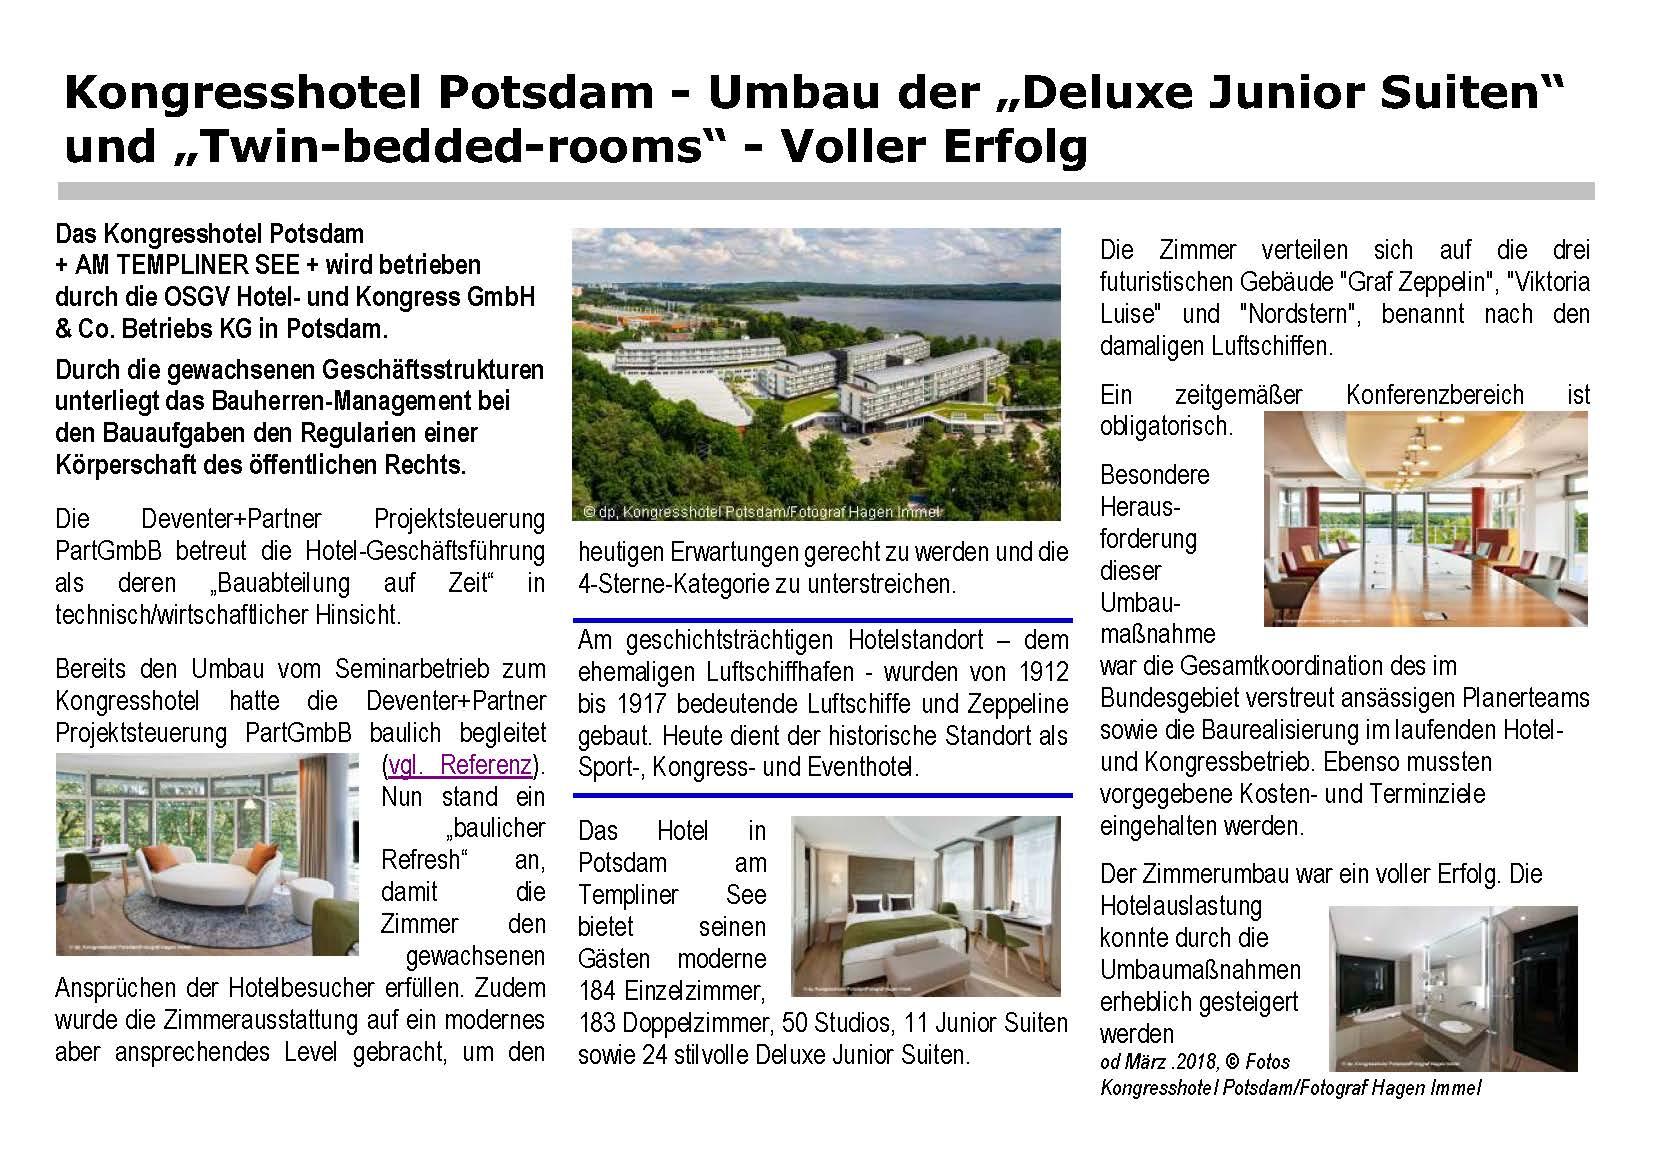 Kongresshotel Potsdam - Bericht Zimmerumbau